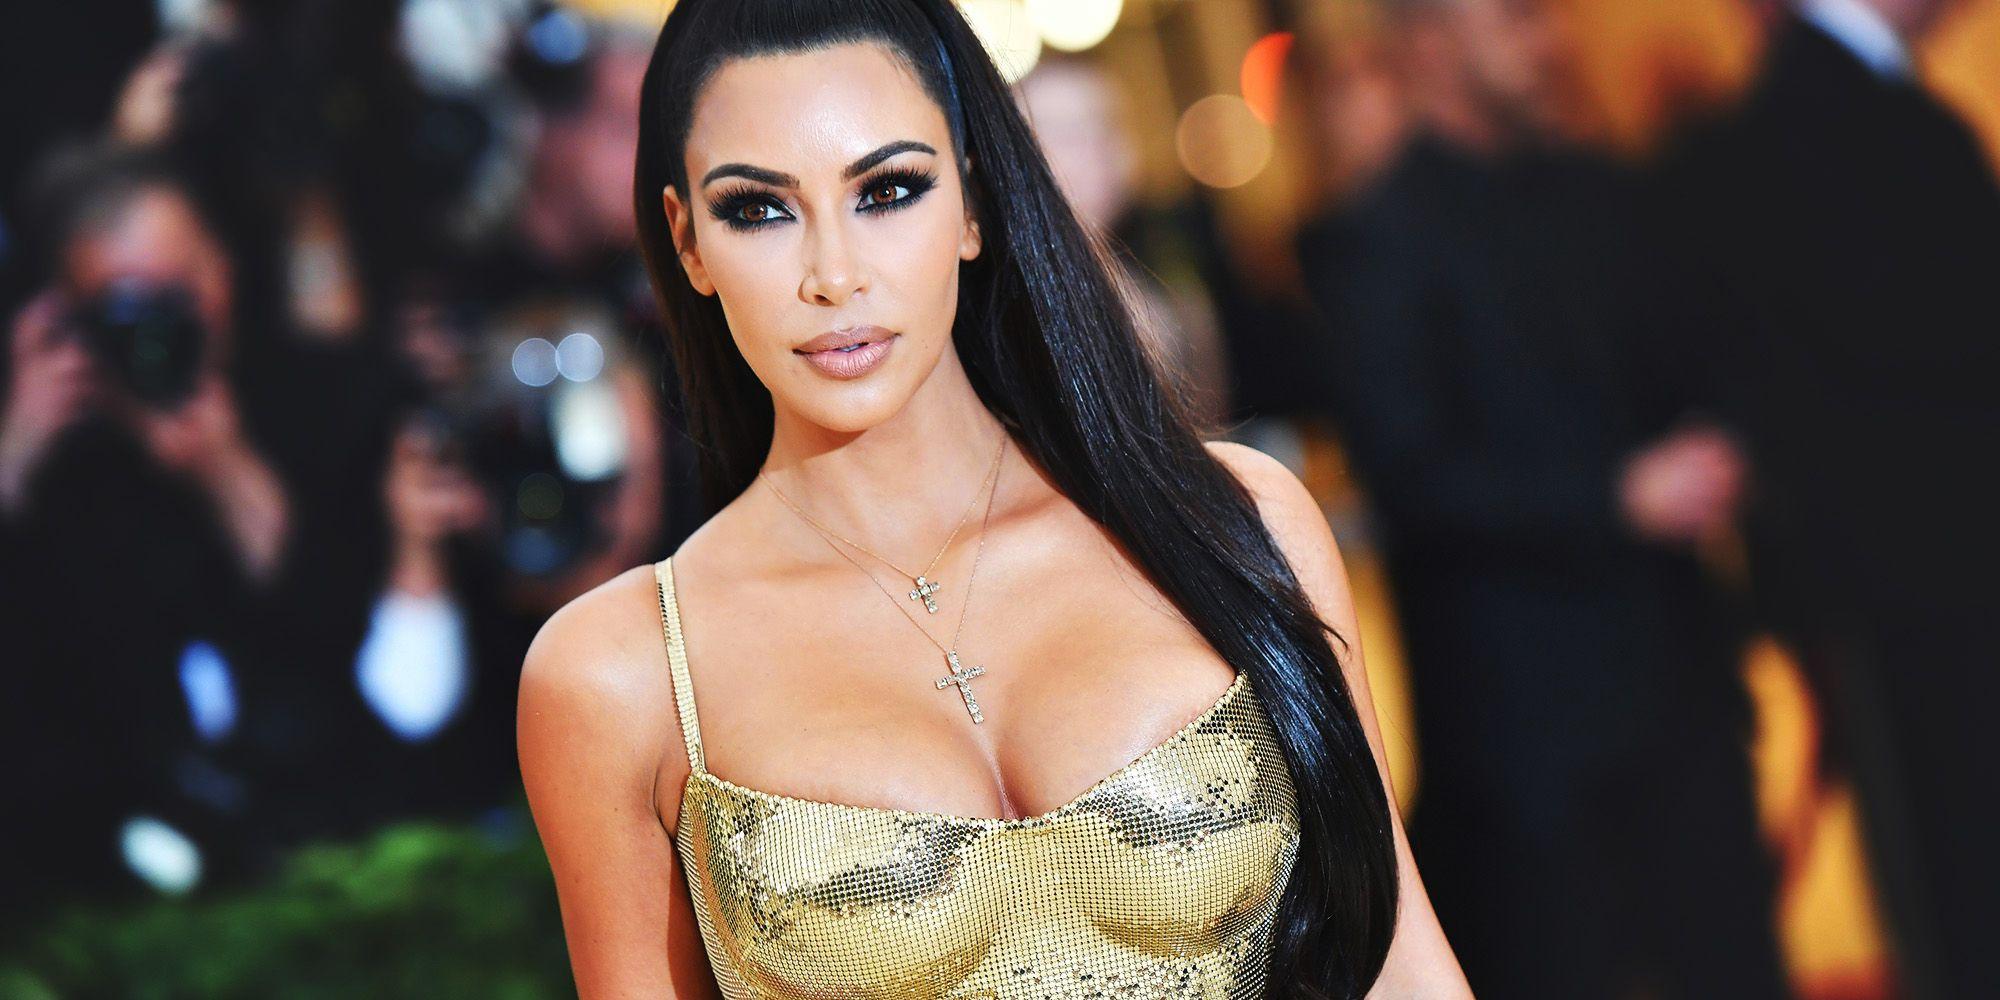 Kim kardasian full sex video pics gallery 2018